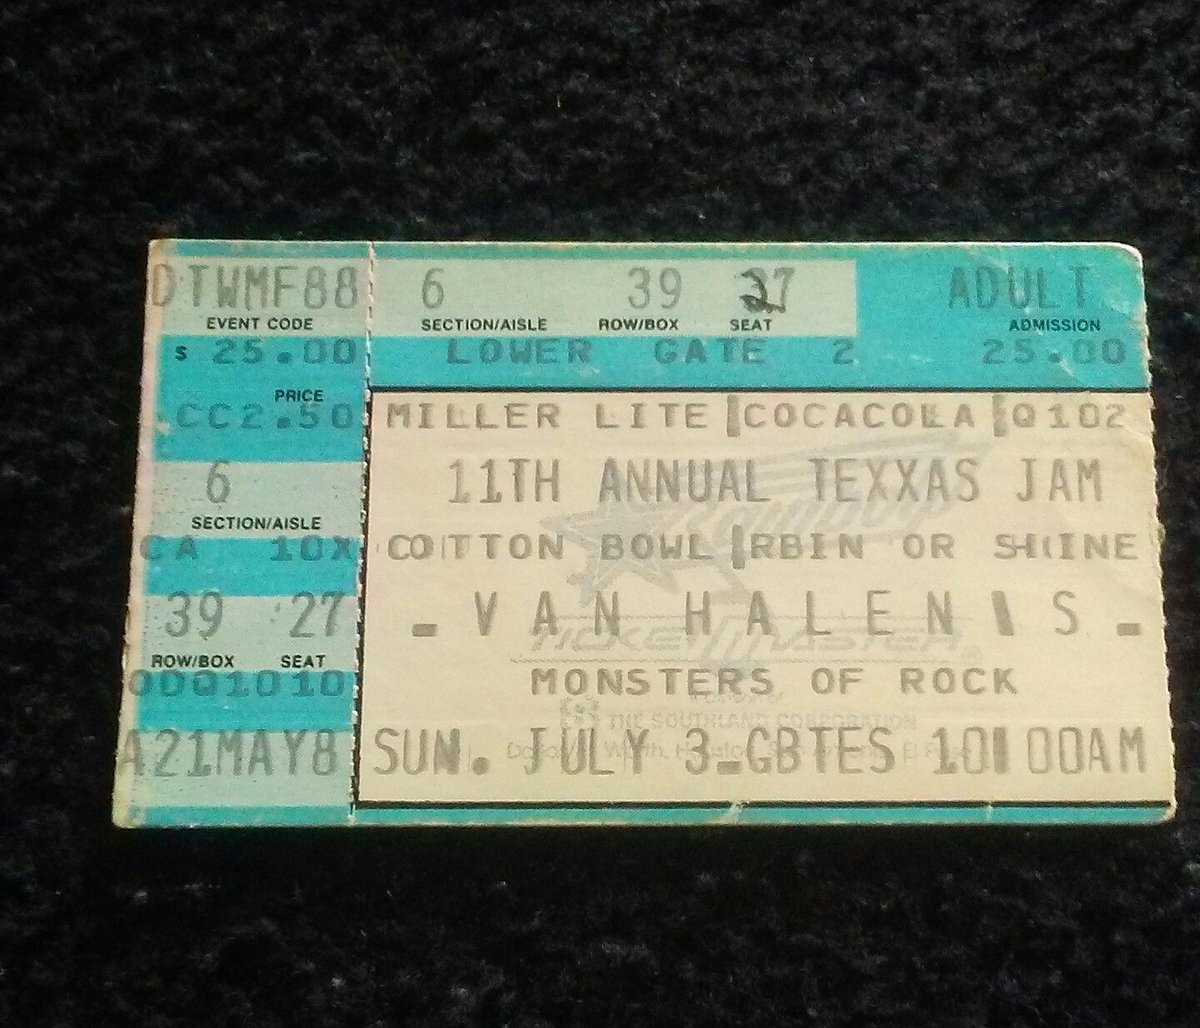 @MetalHammer @Metallica I saw that tour,last time seeing Metallica as an opening band.